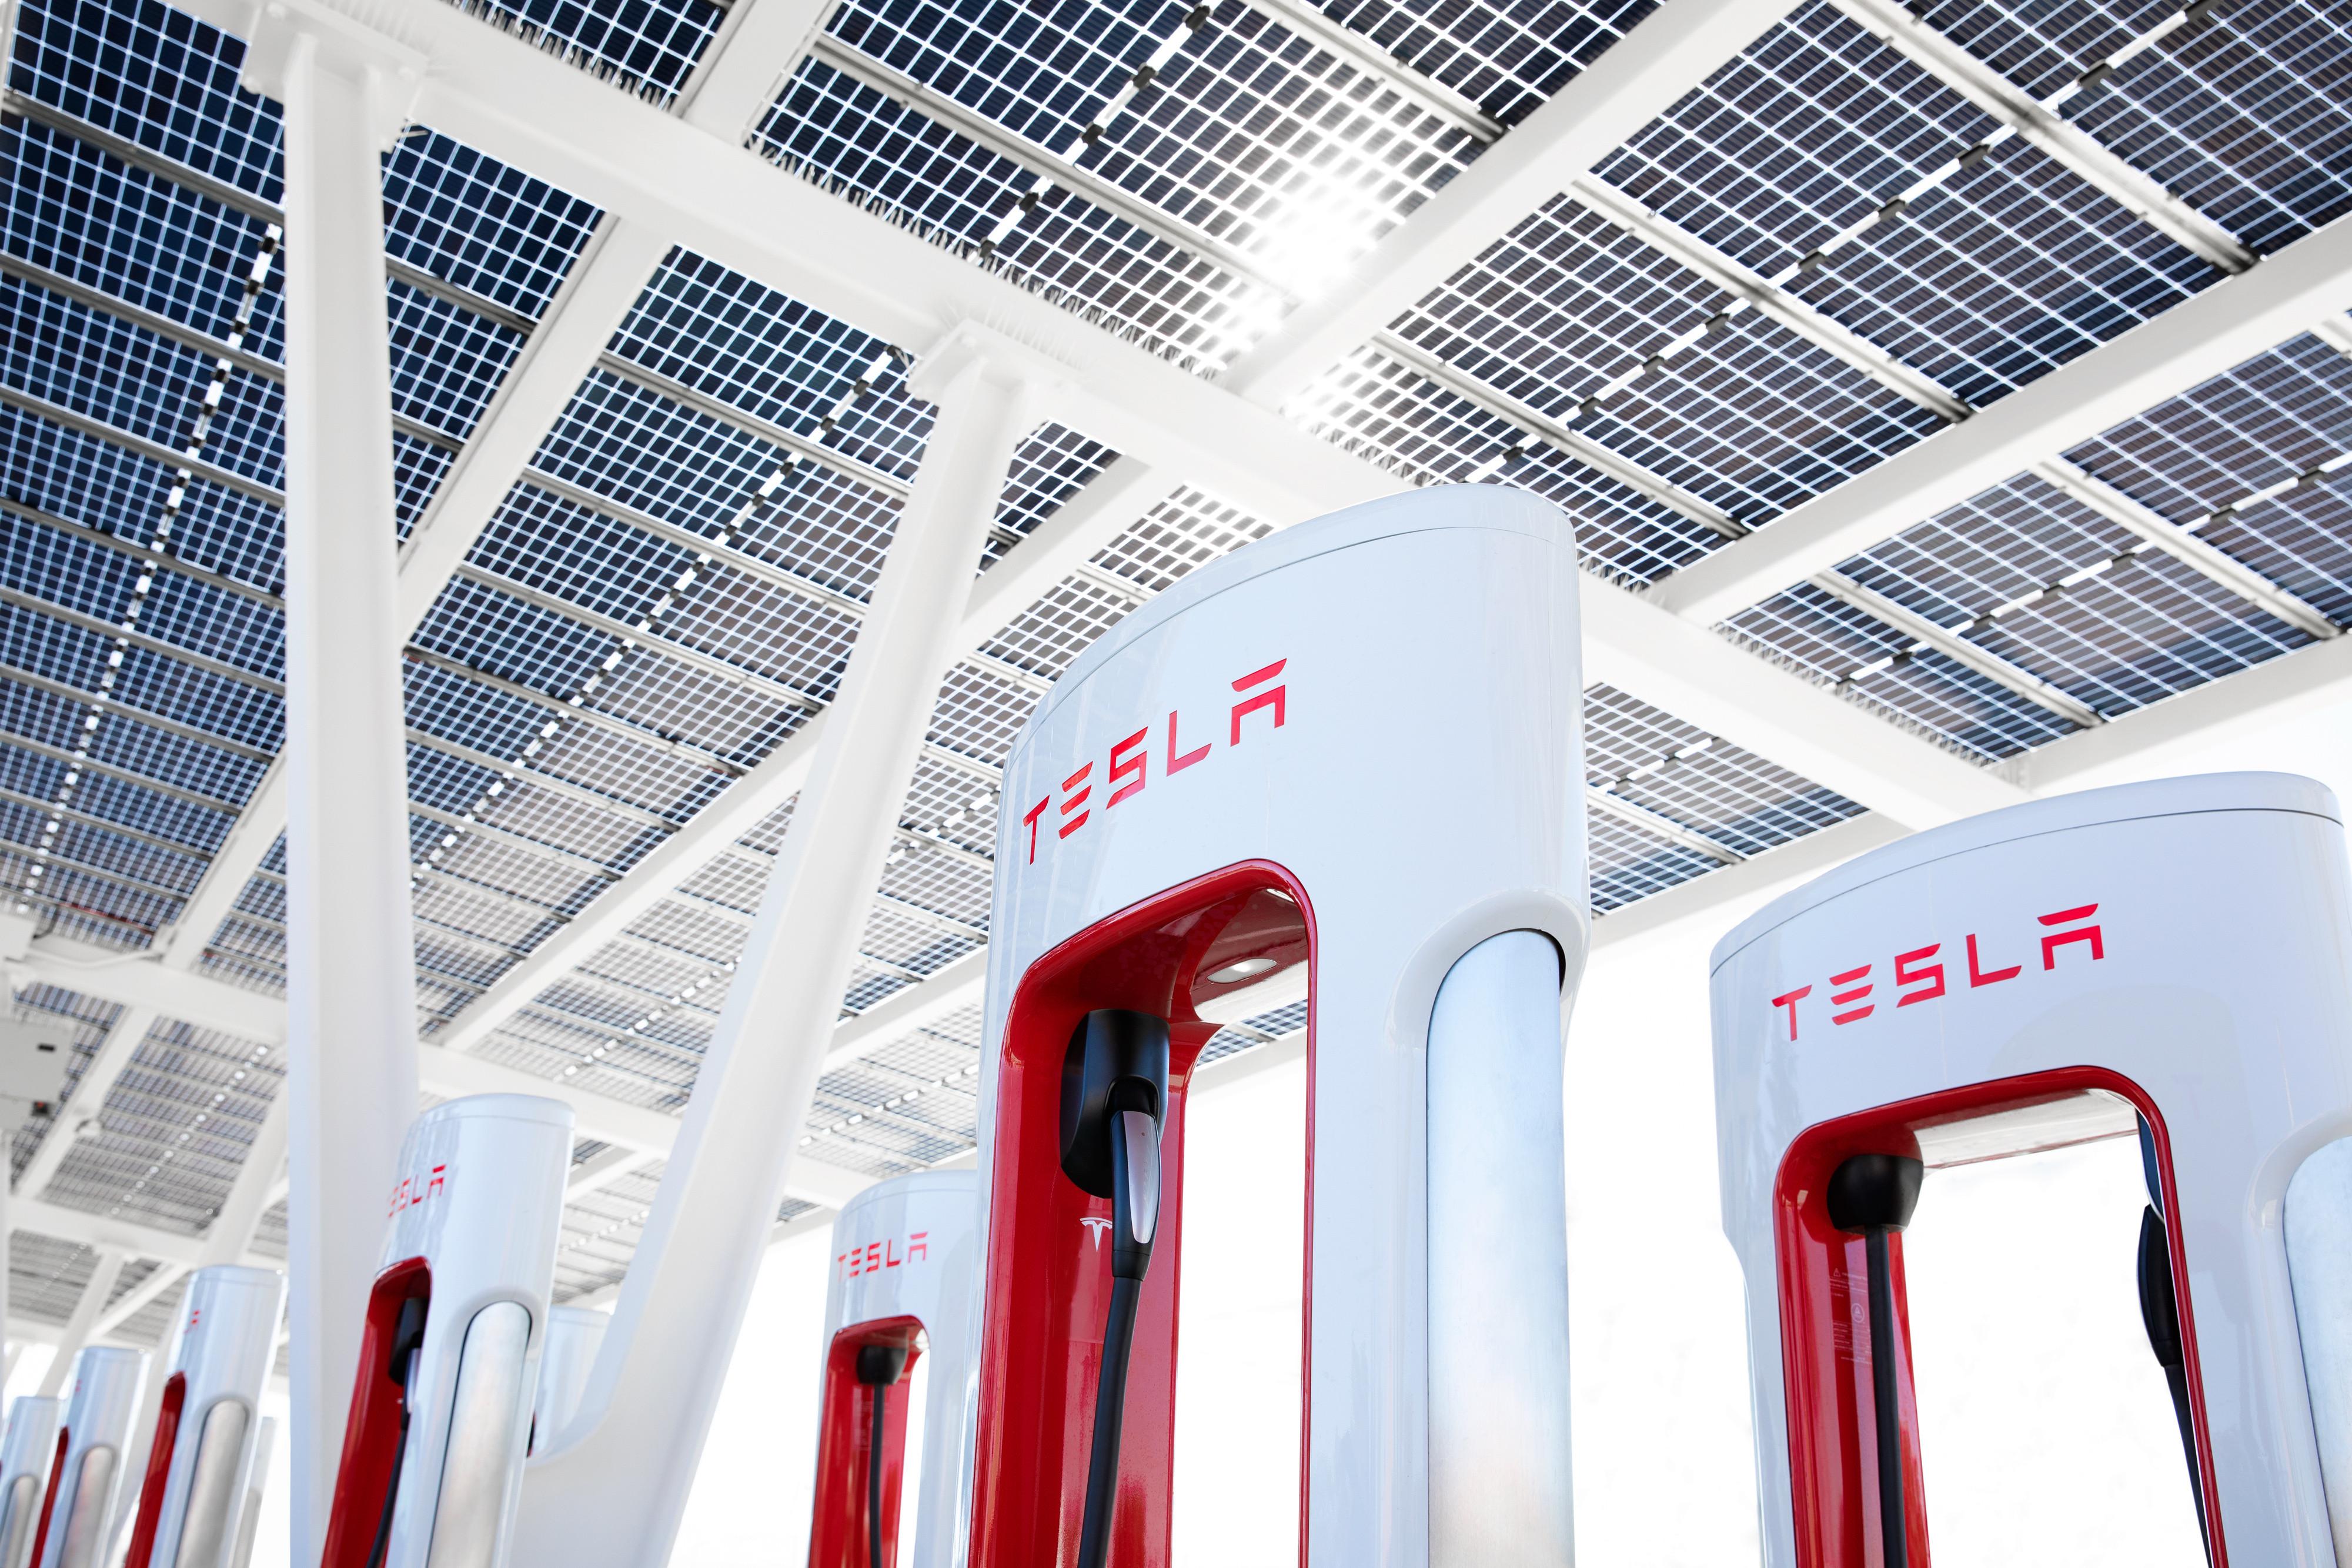 techcrunch.com - Aria Alamalhodaei - Tesla, BHP ink supply deal for nickel ahead of demand surge